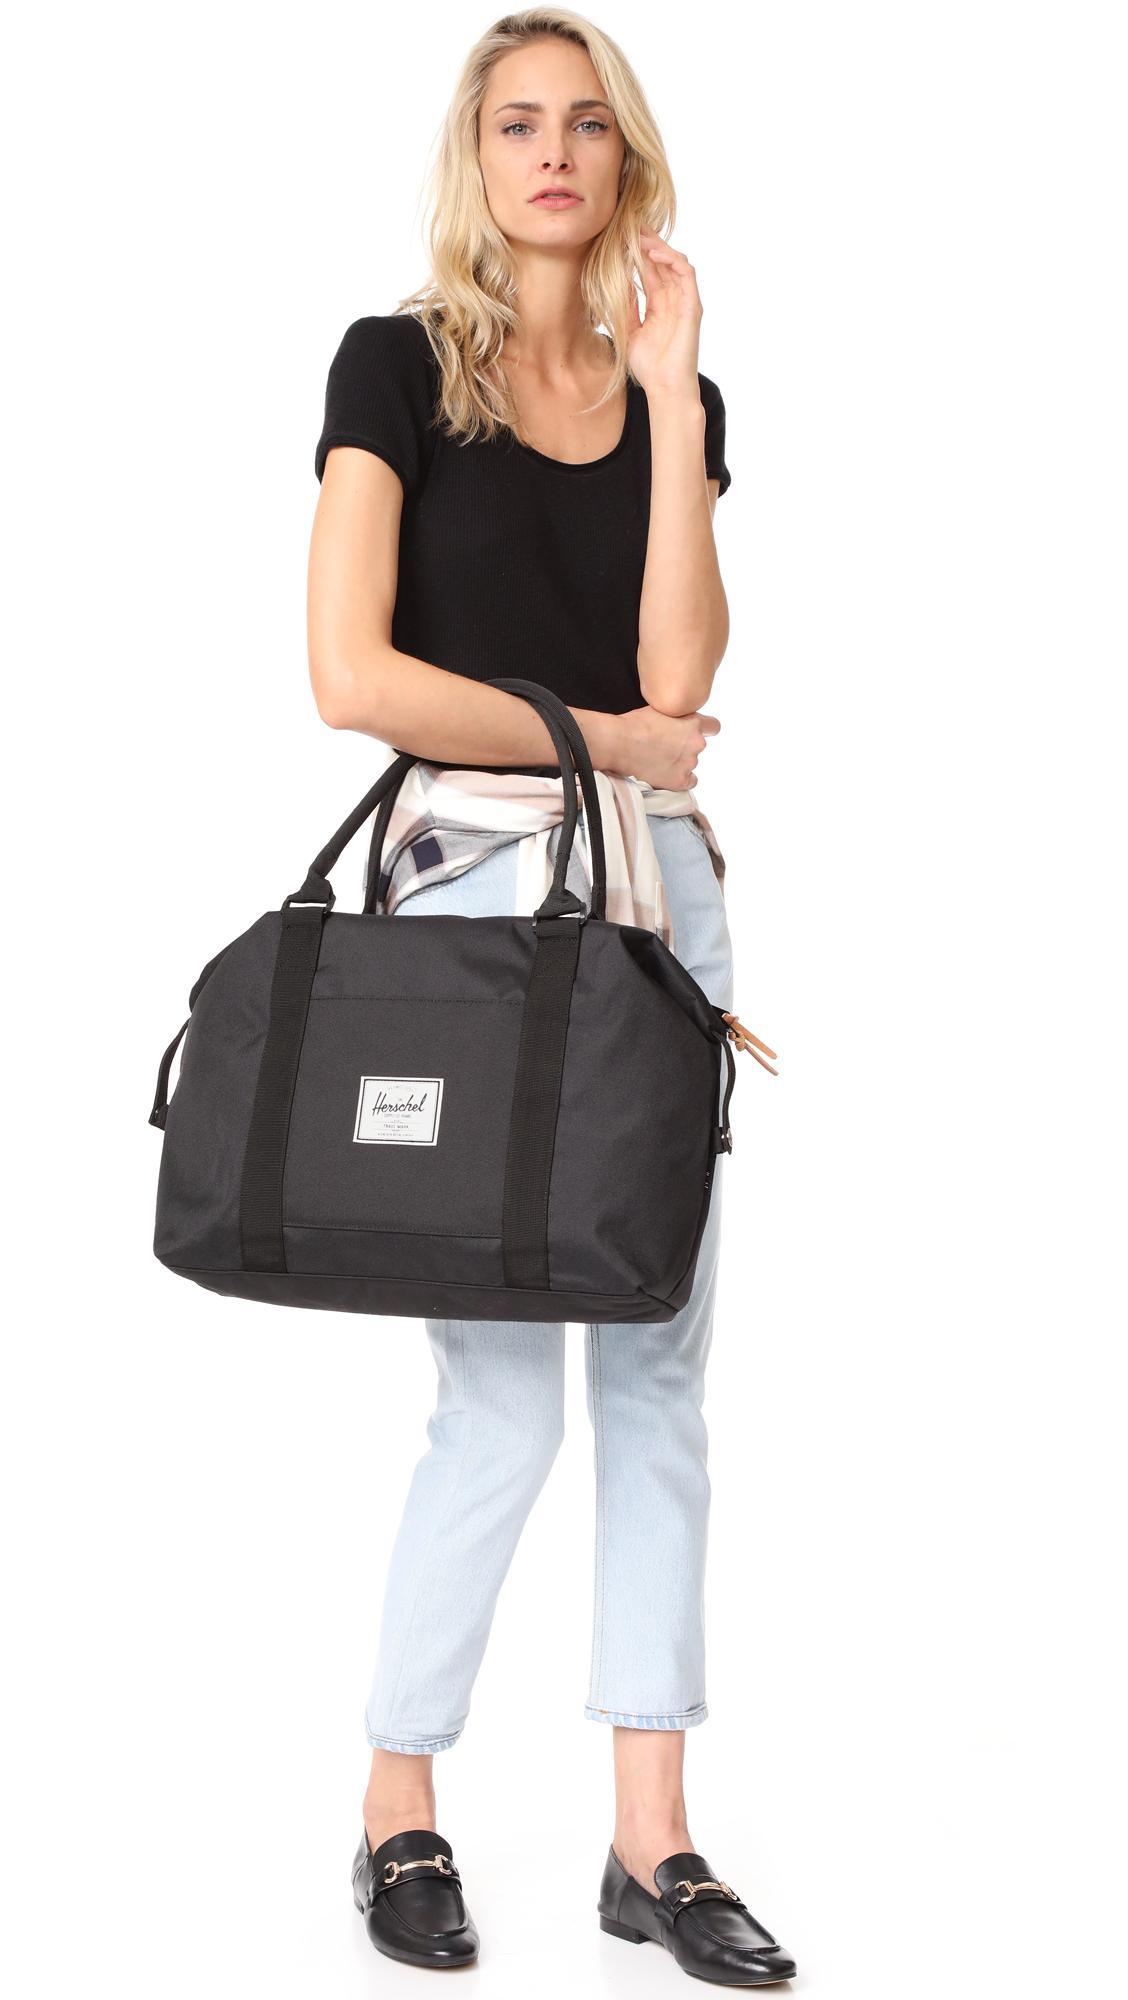 4c0b4e889b Lyst - Herschel Supply Co. Strand Duffel Bag in Black